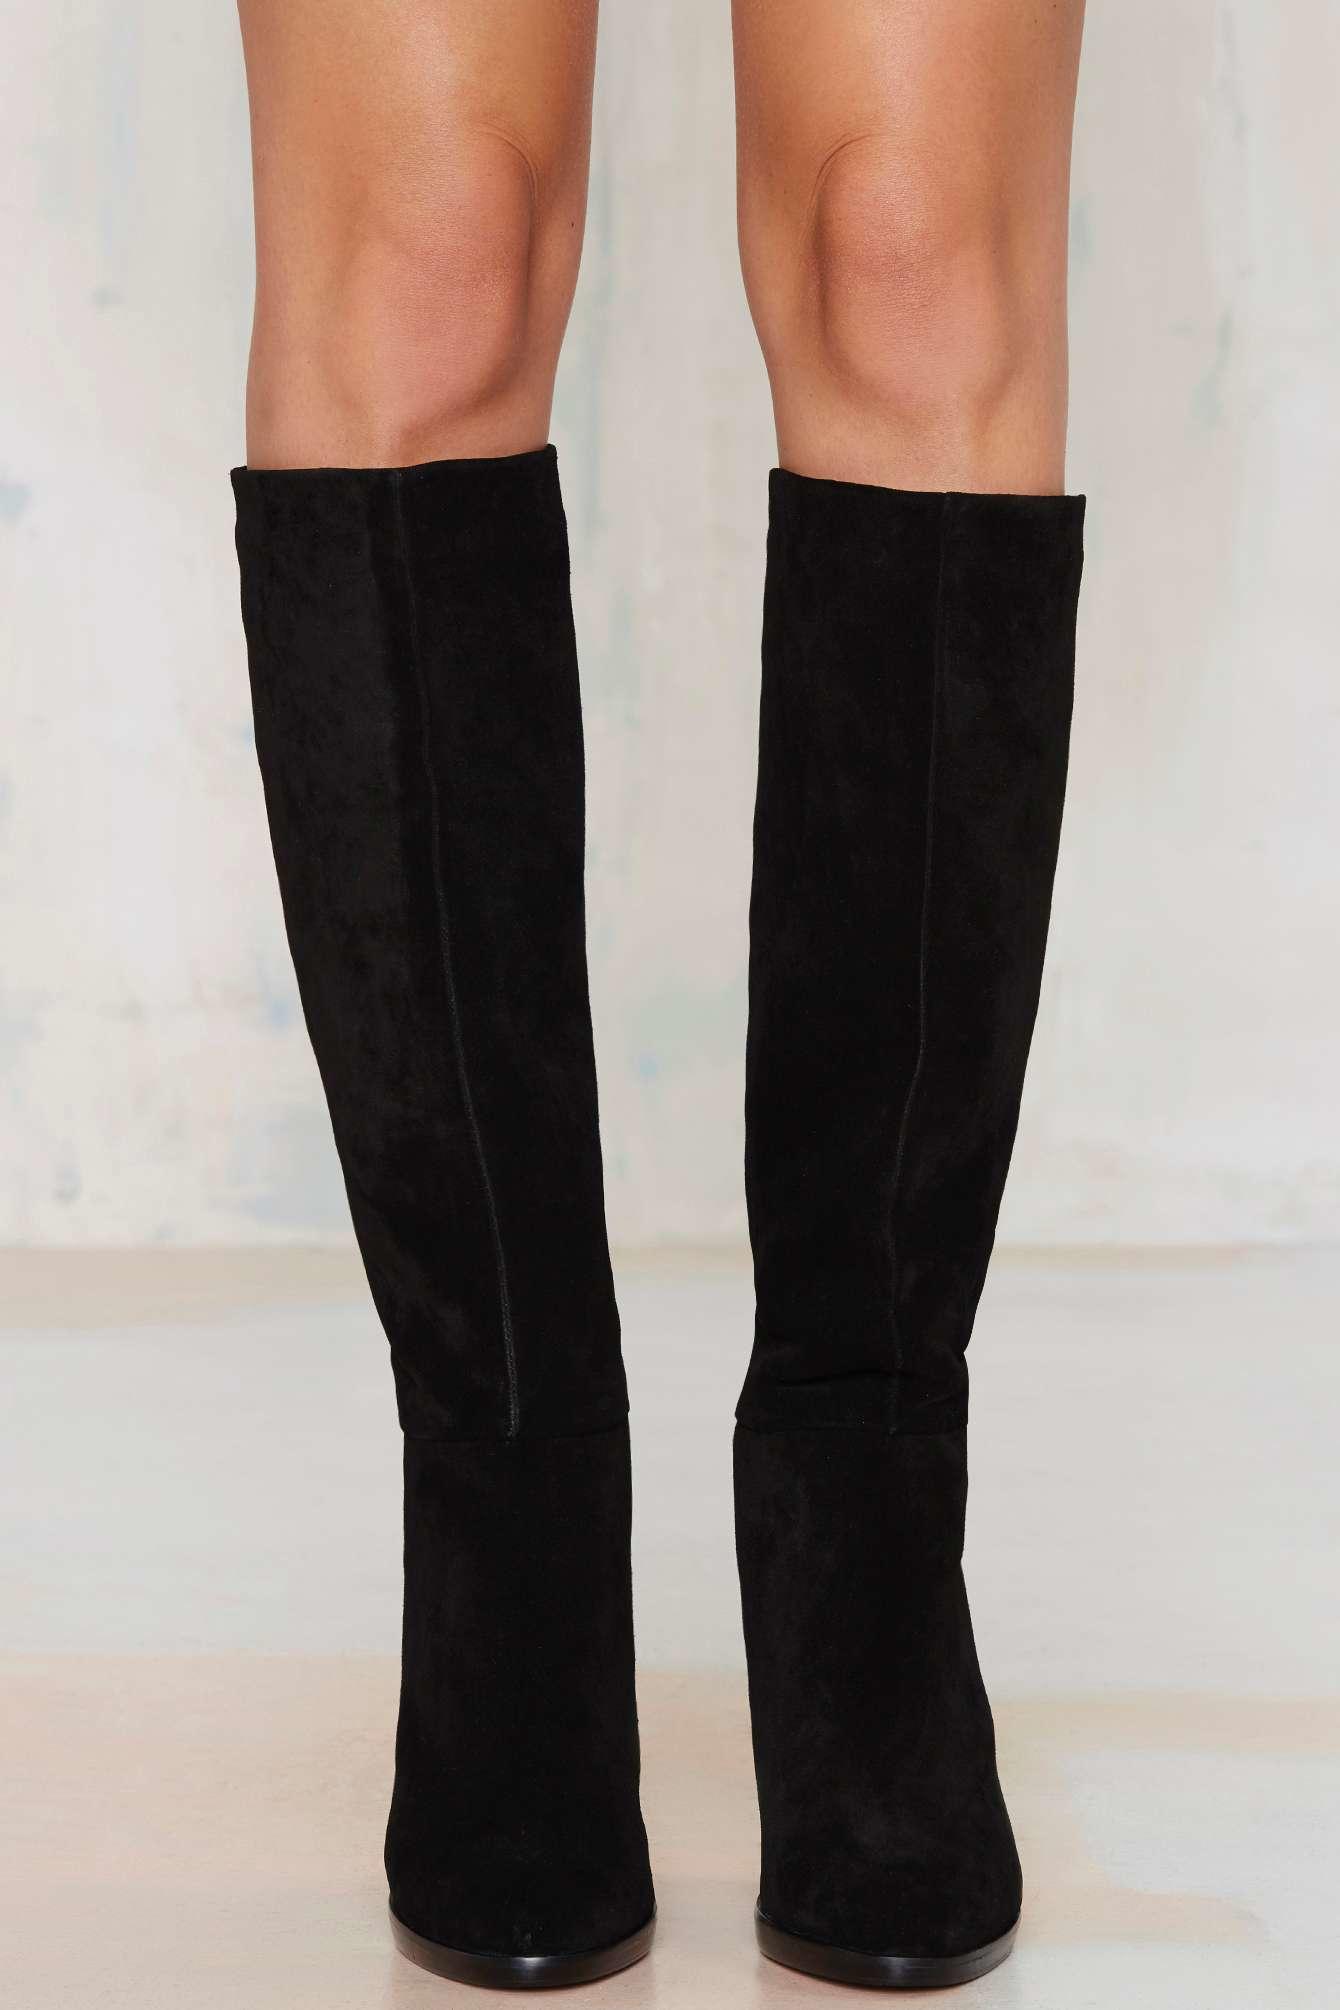 Nasty gal Report Lannister Knee-high Suede Boot - Black in Black ...